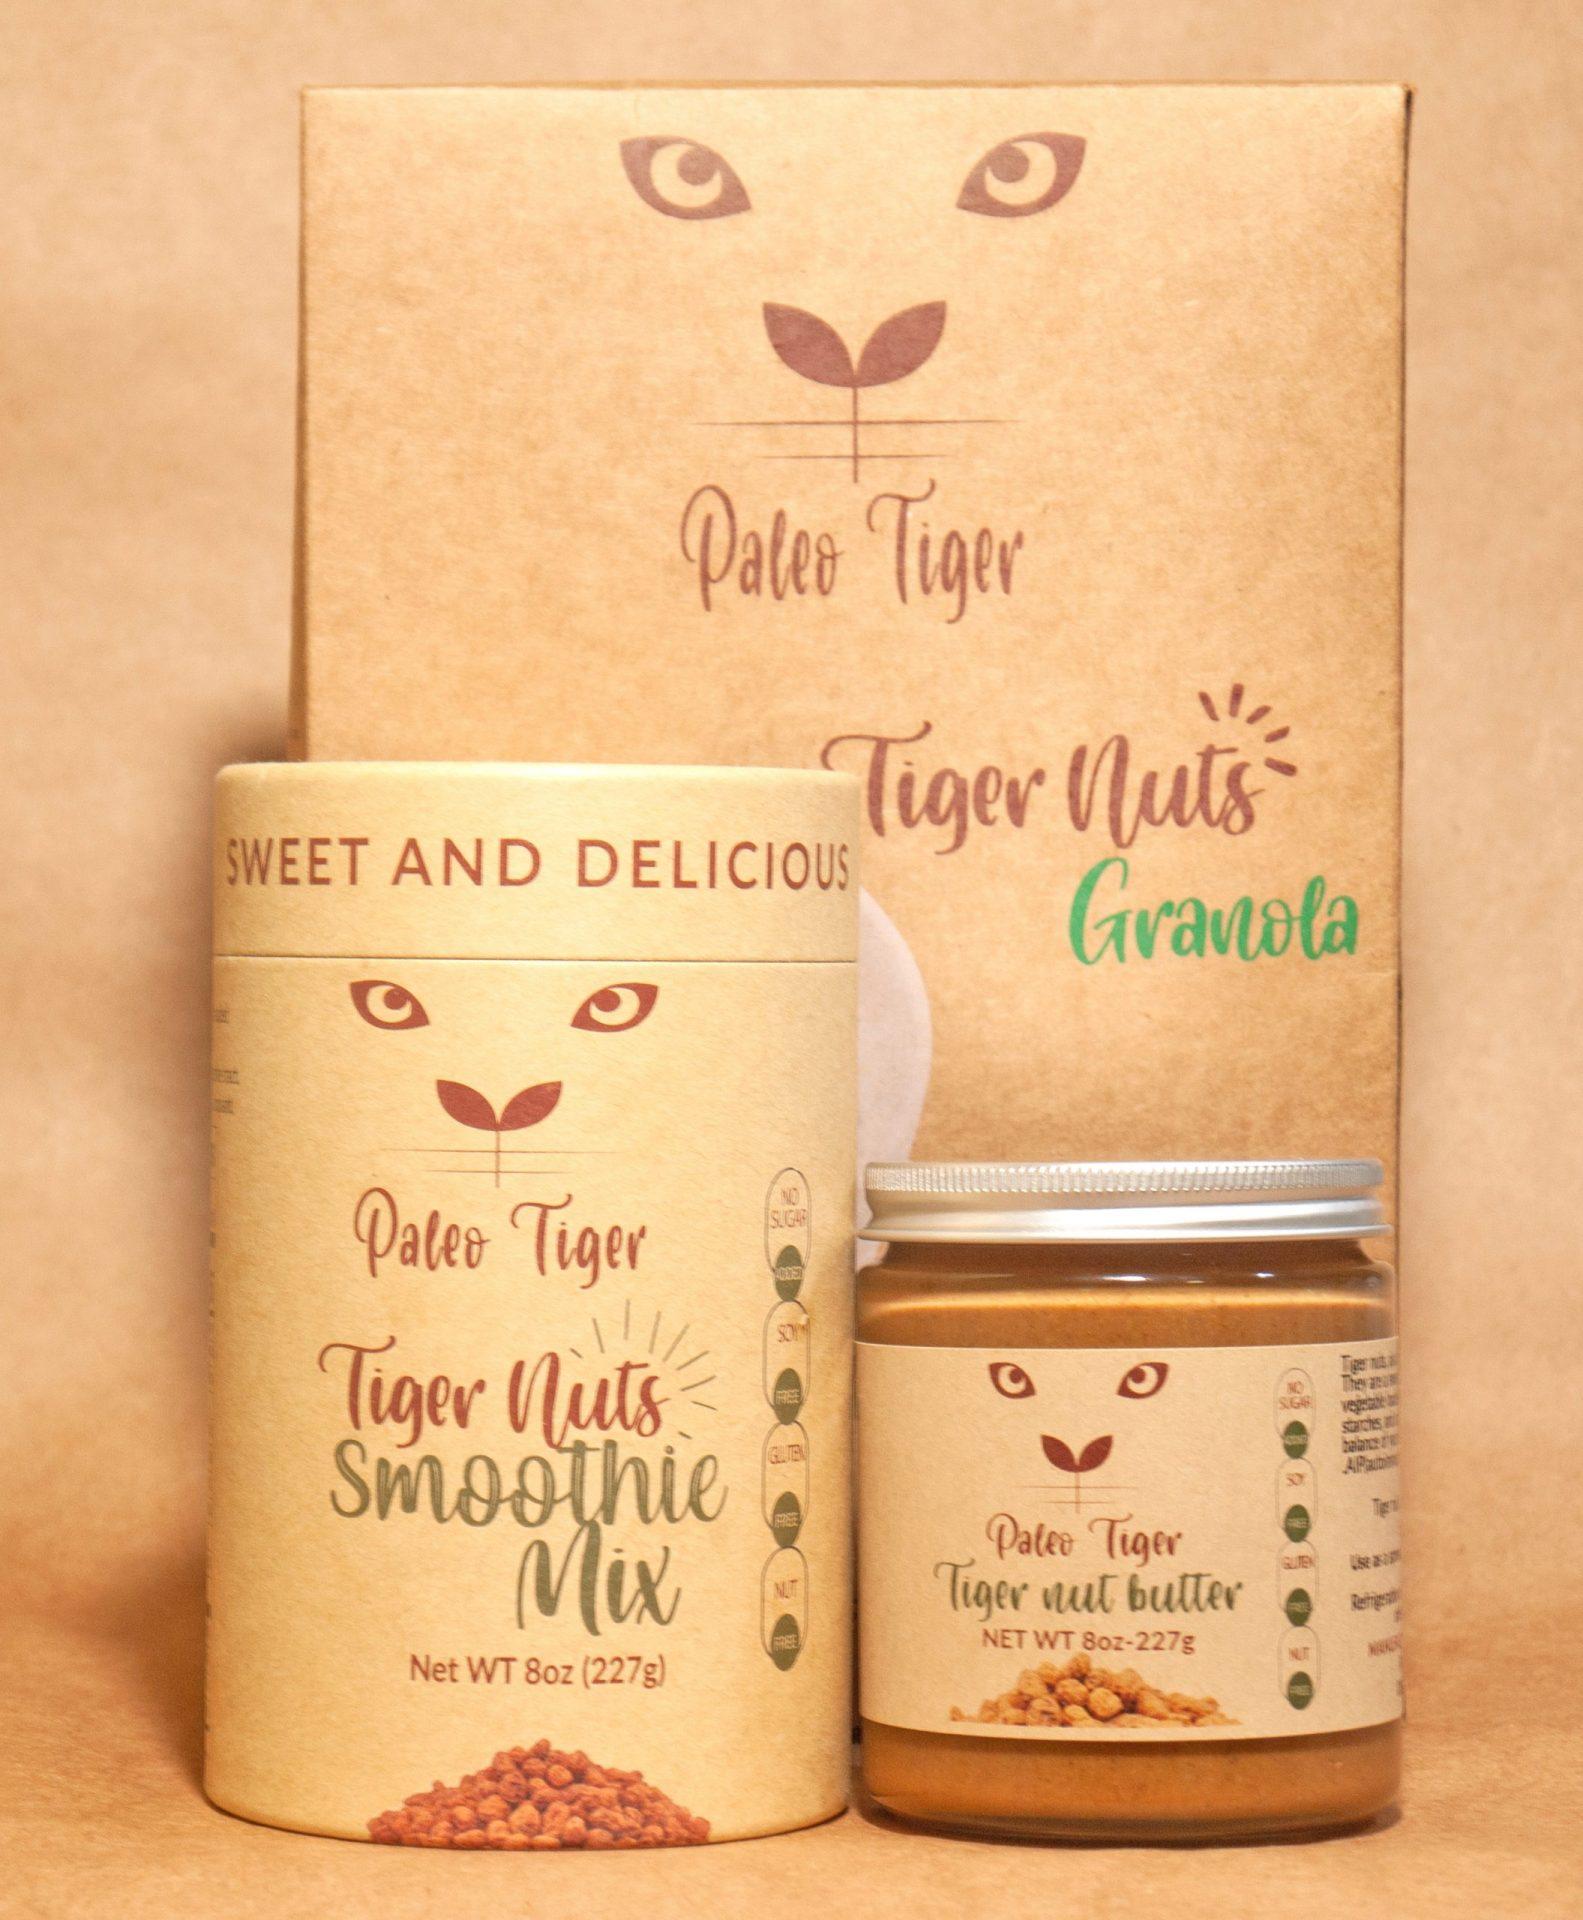 Tiger nuts paste, Granola, Smoothie mix